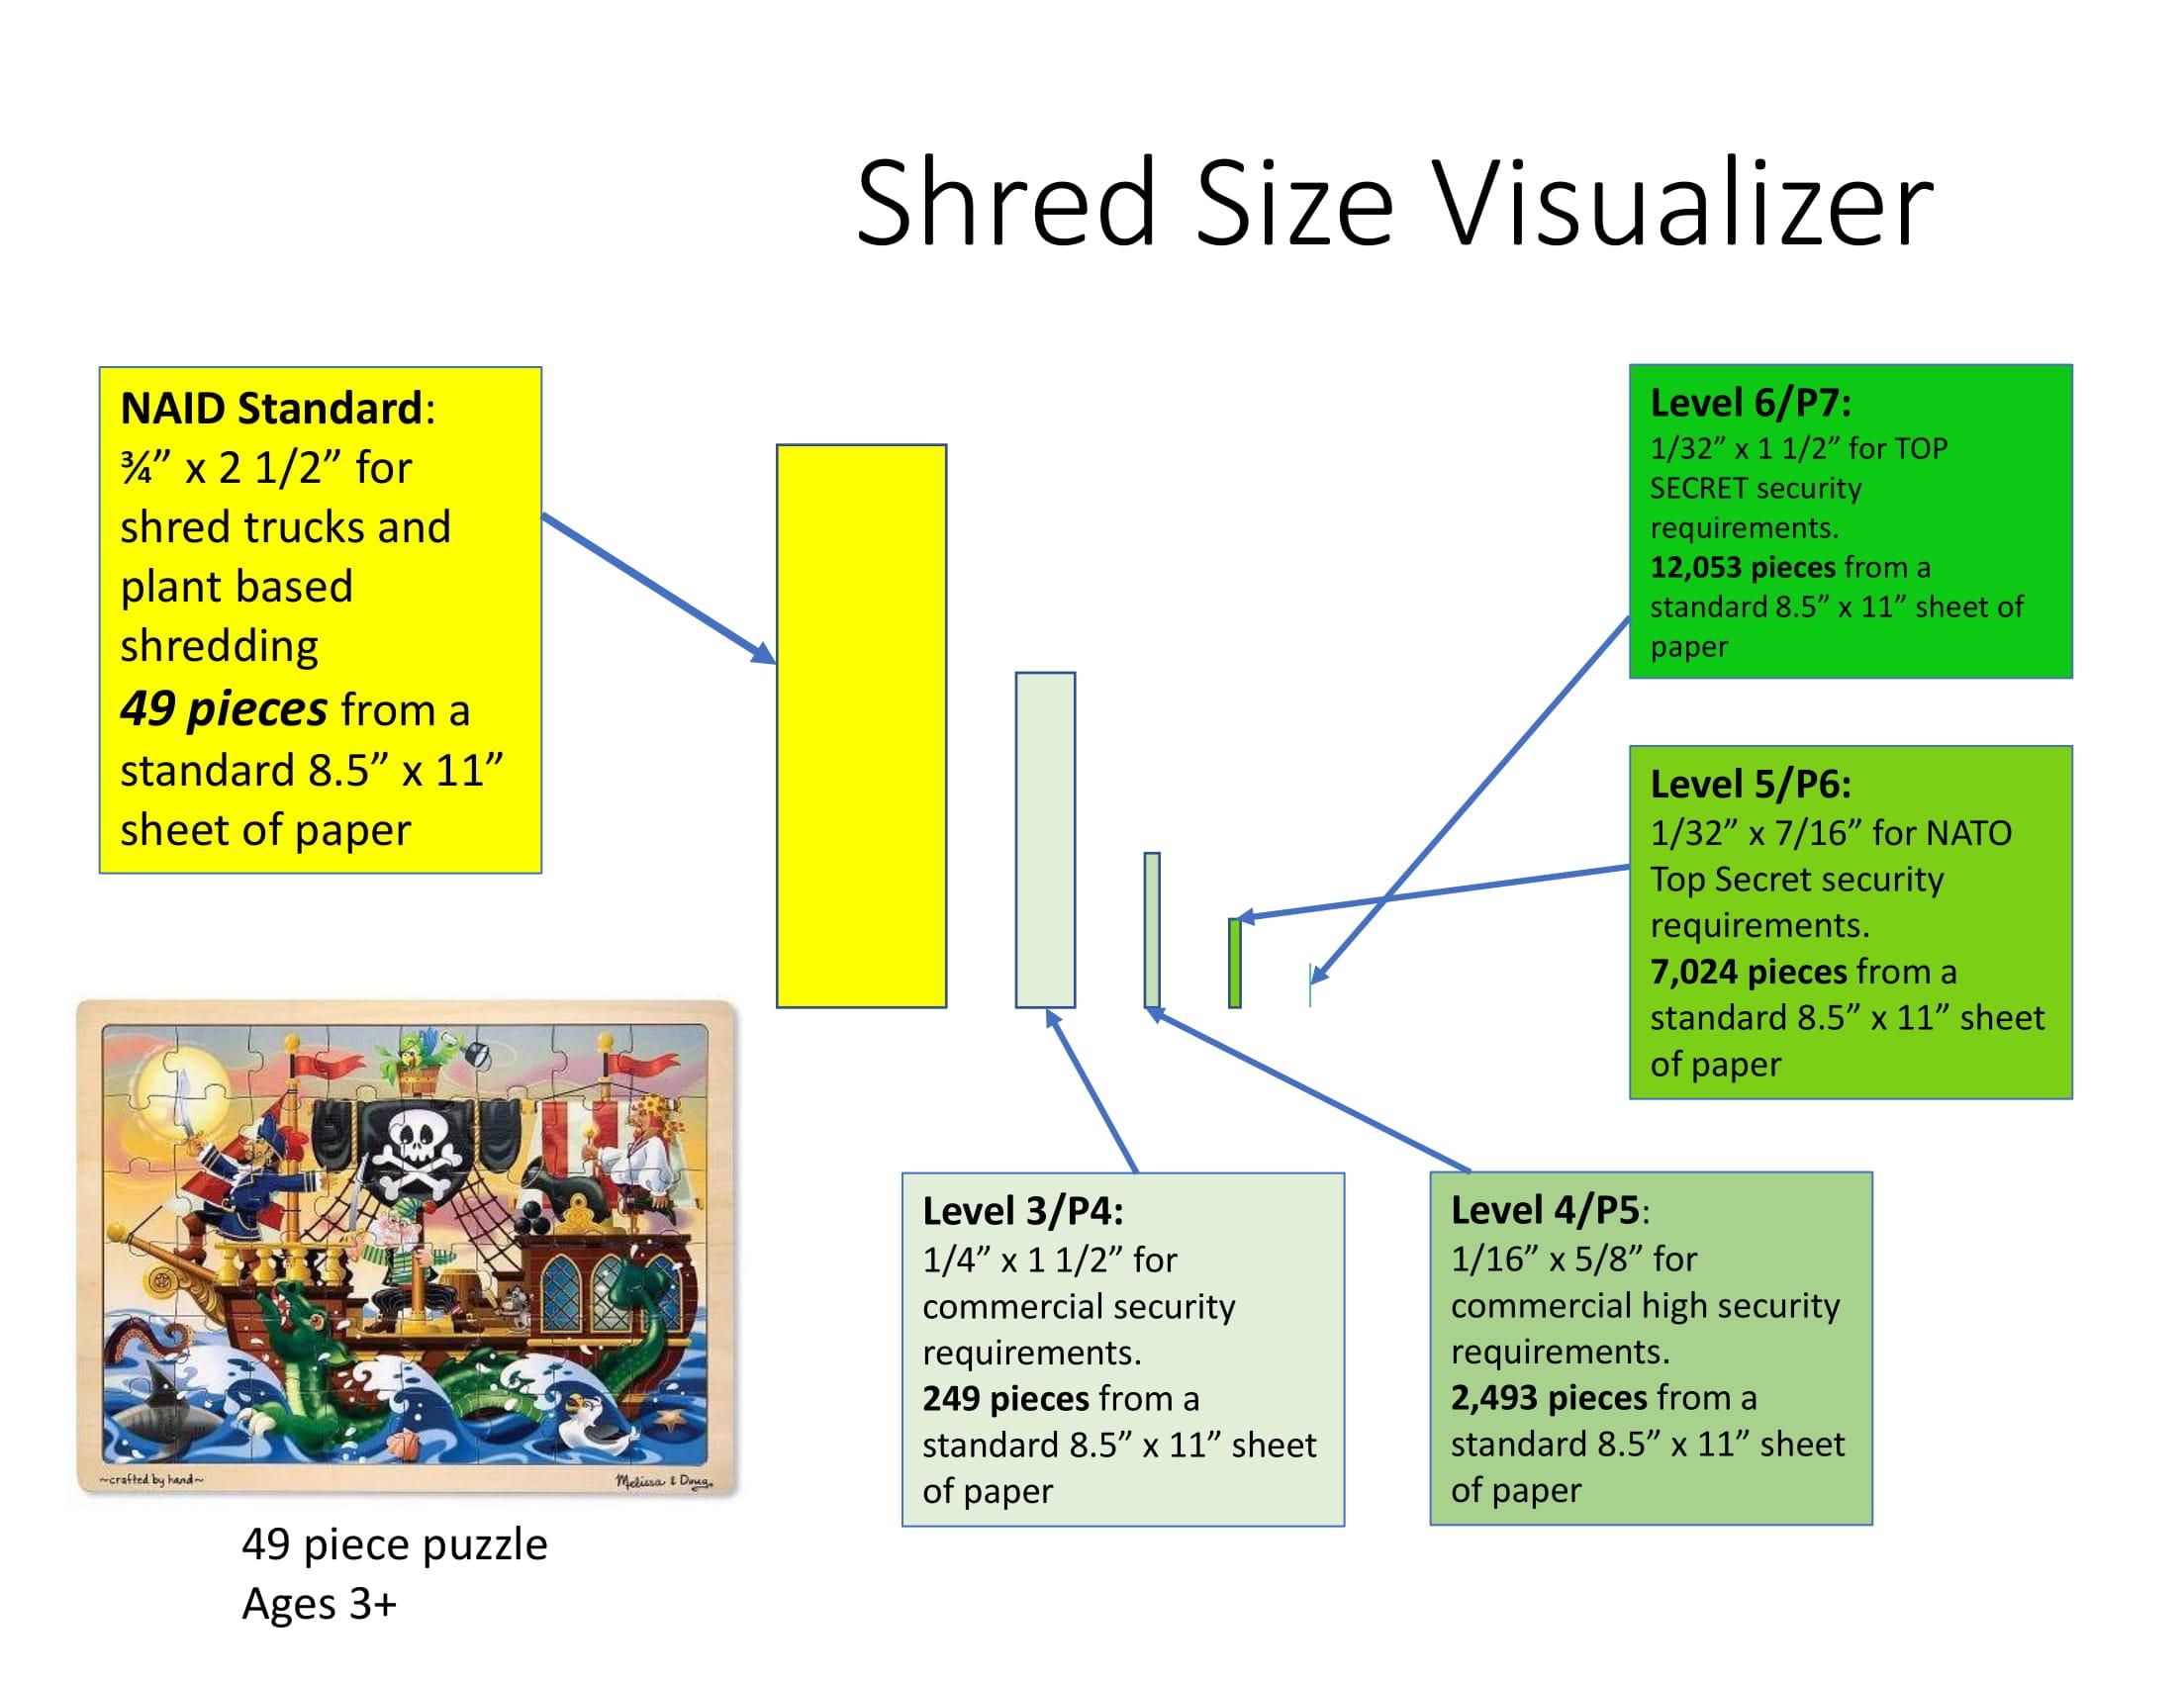 shred size visualizer